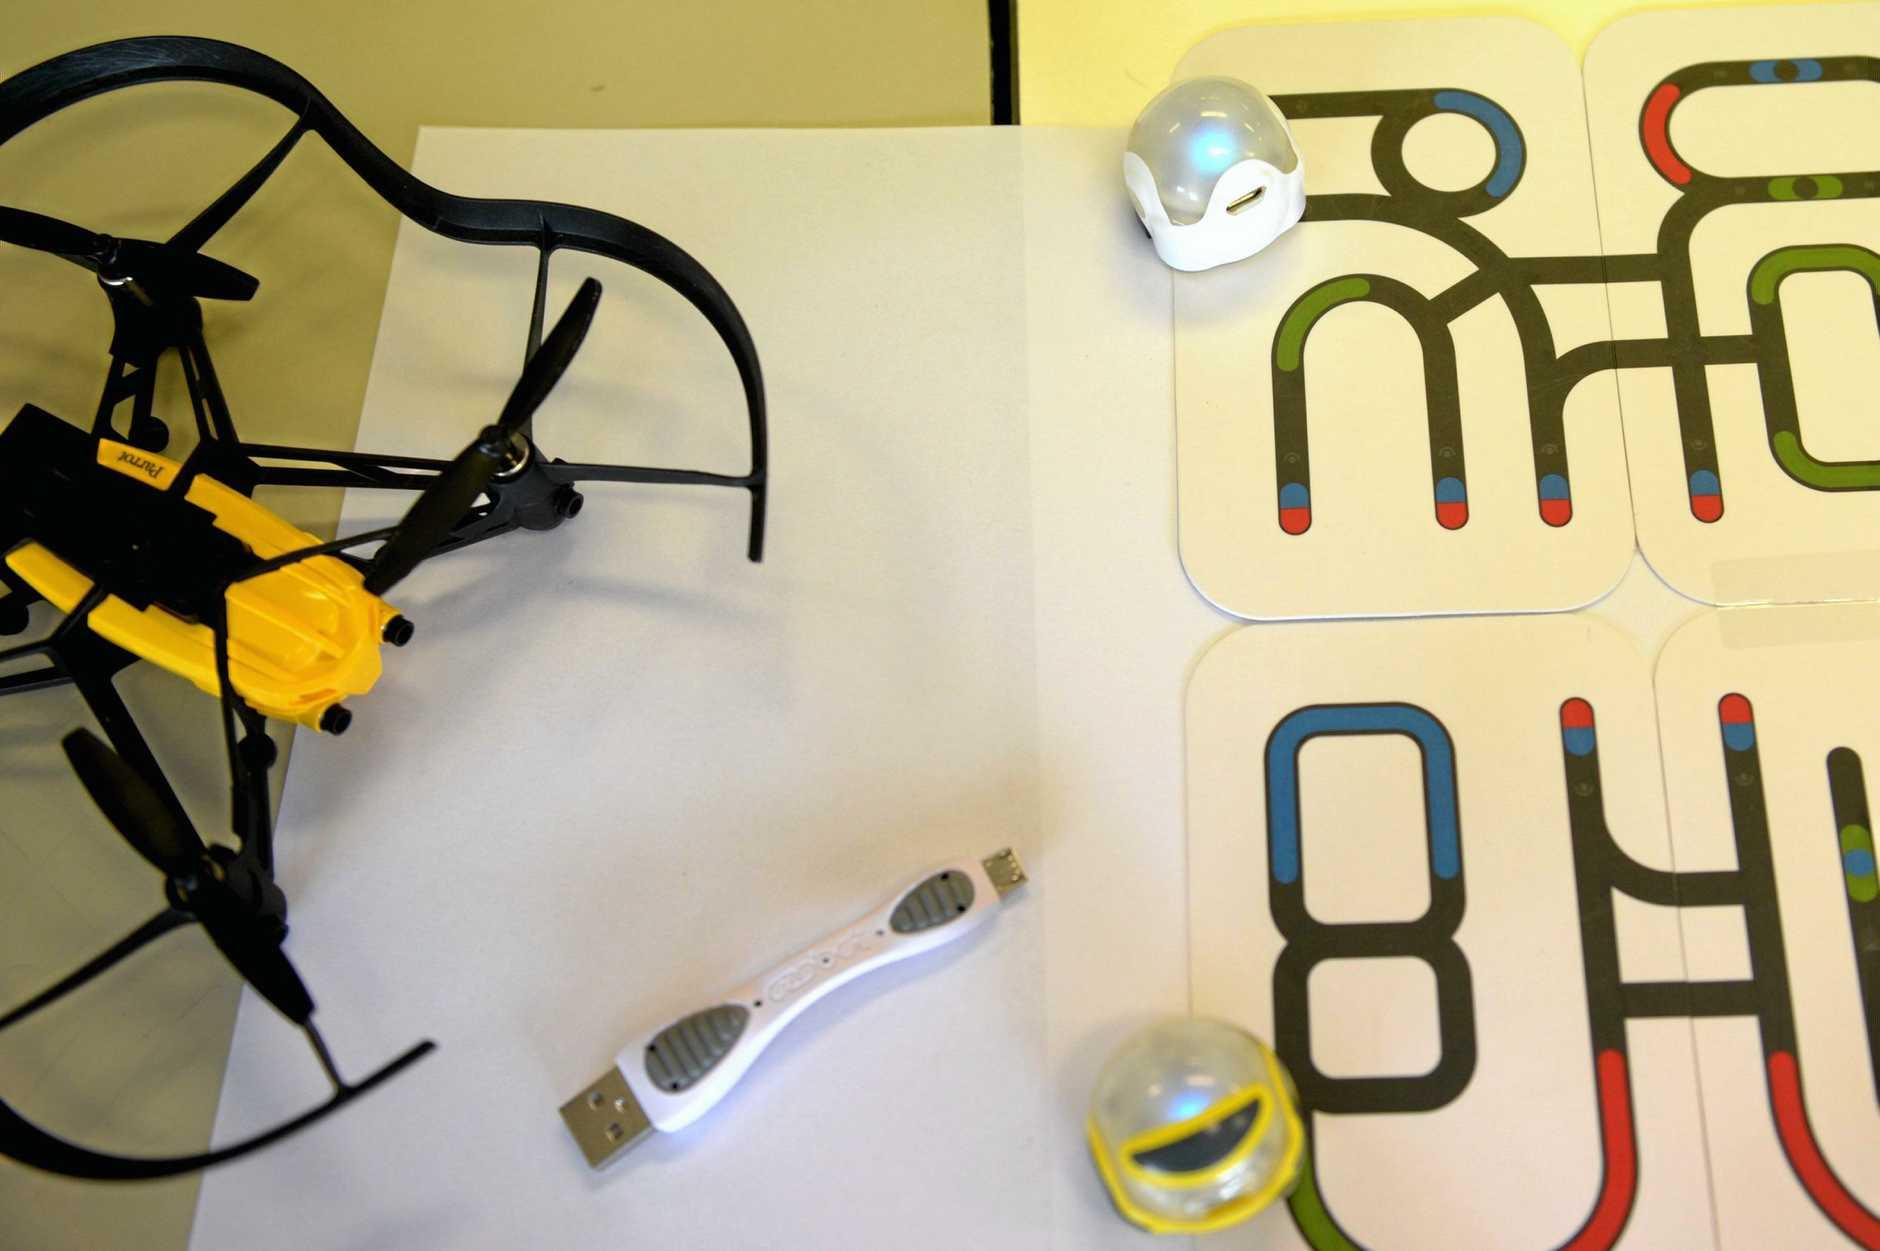 Ozobot robots teach robotics and coding in schools